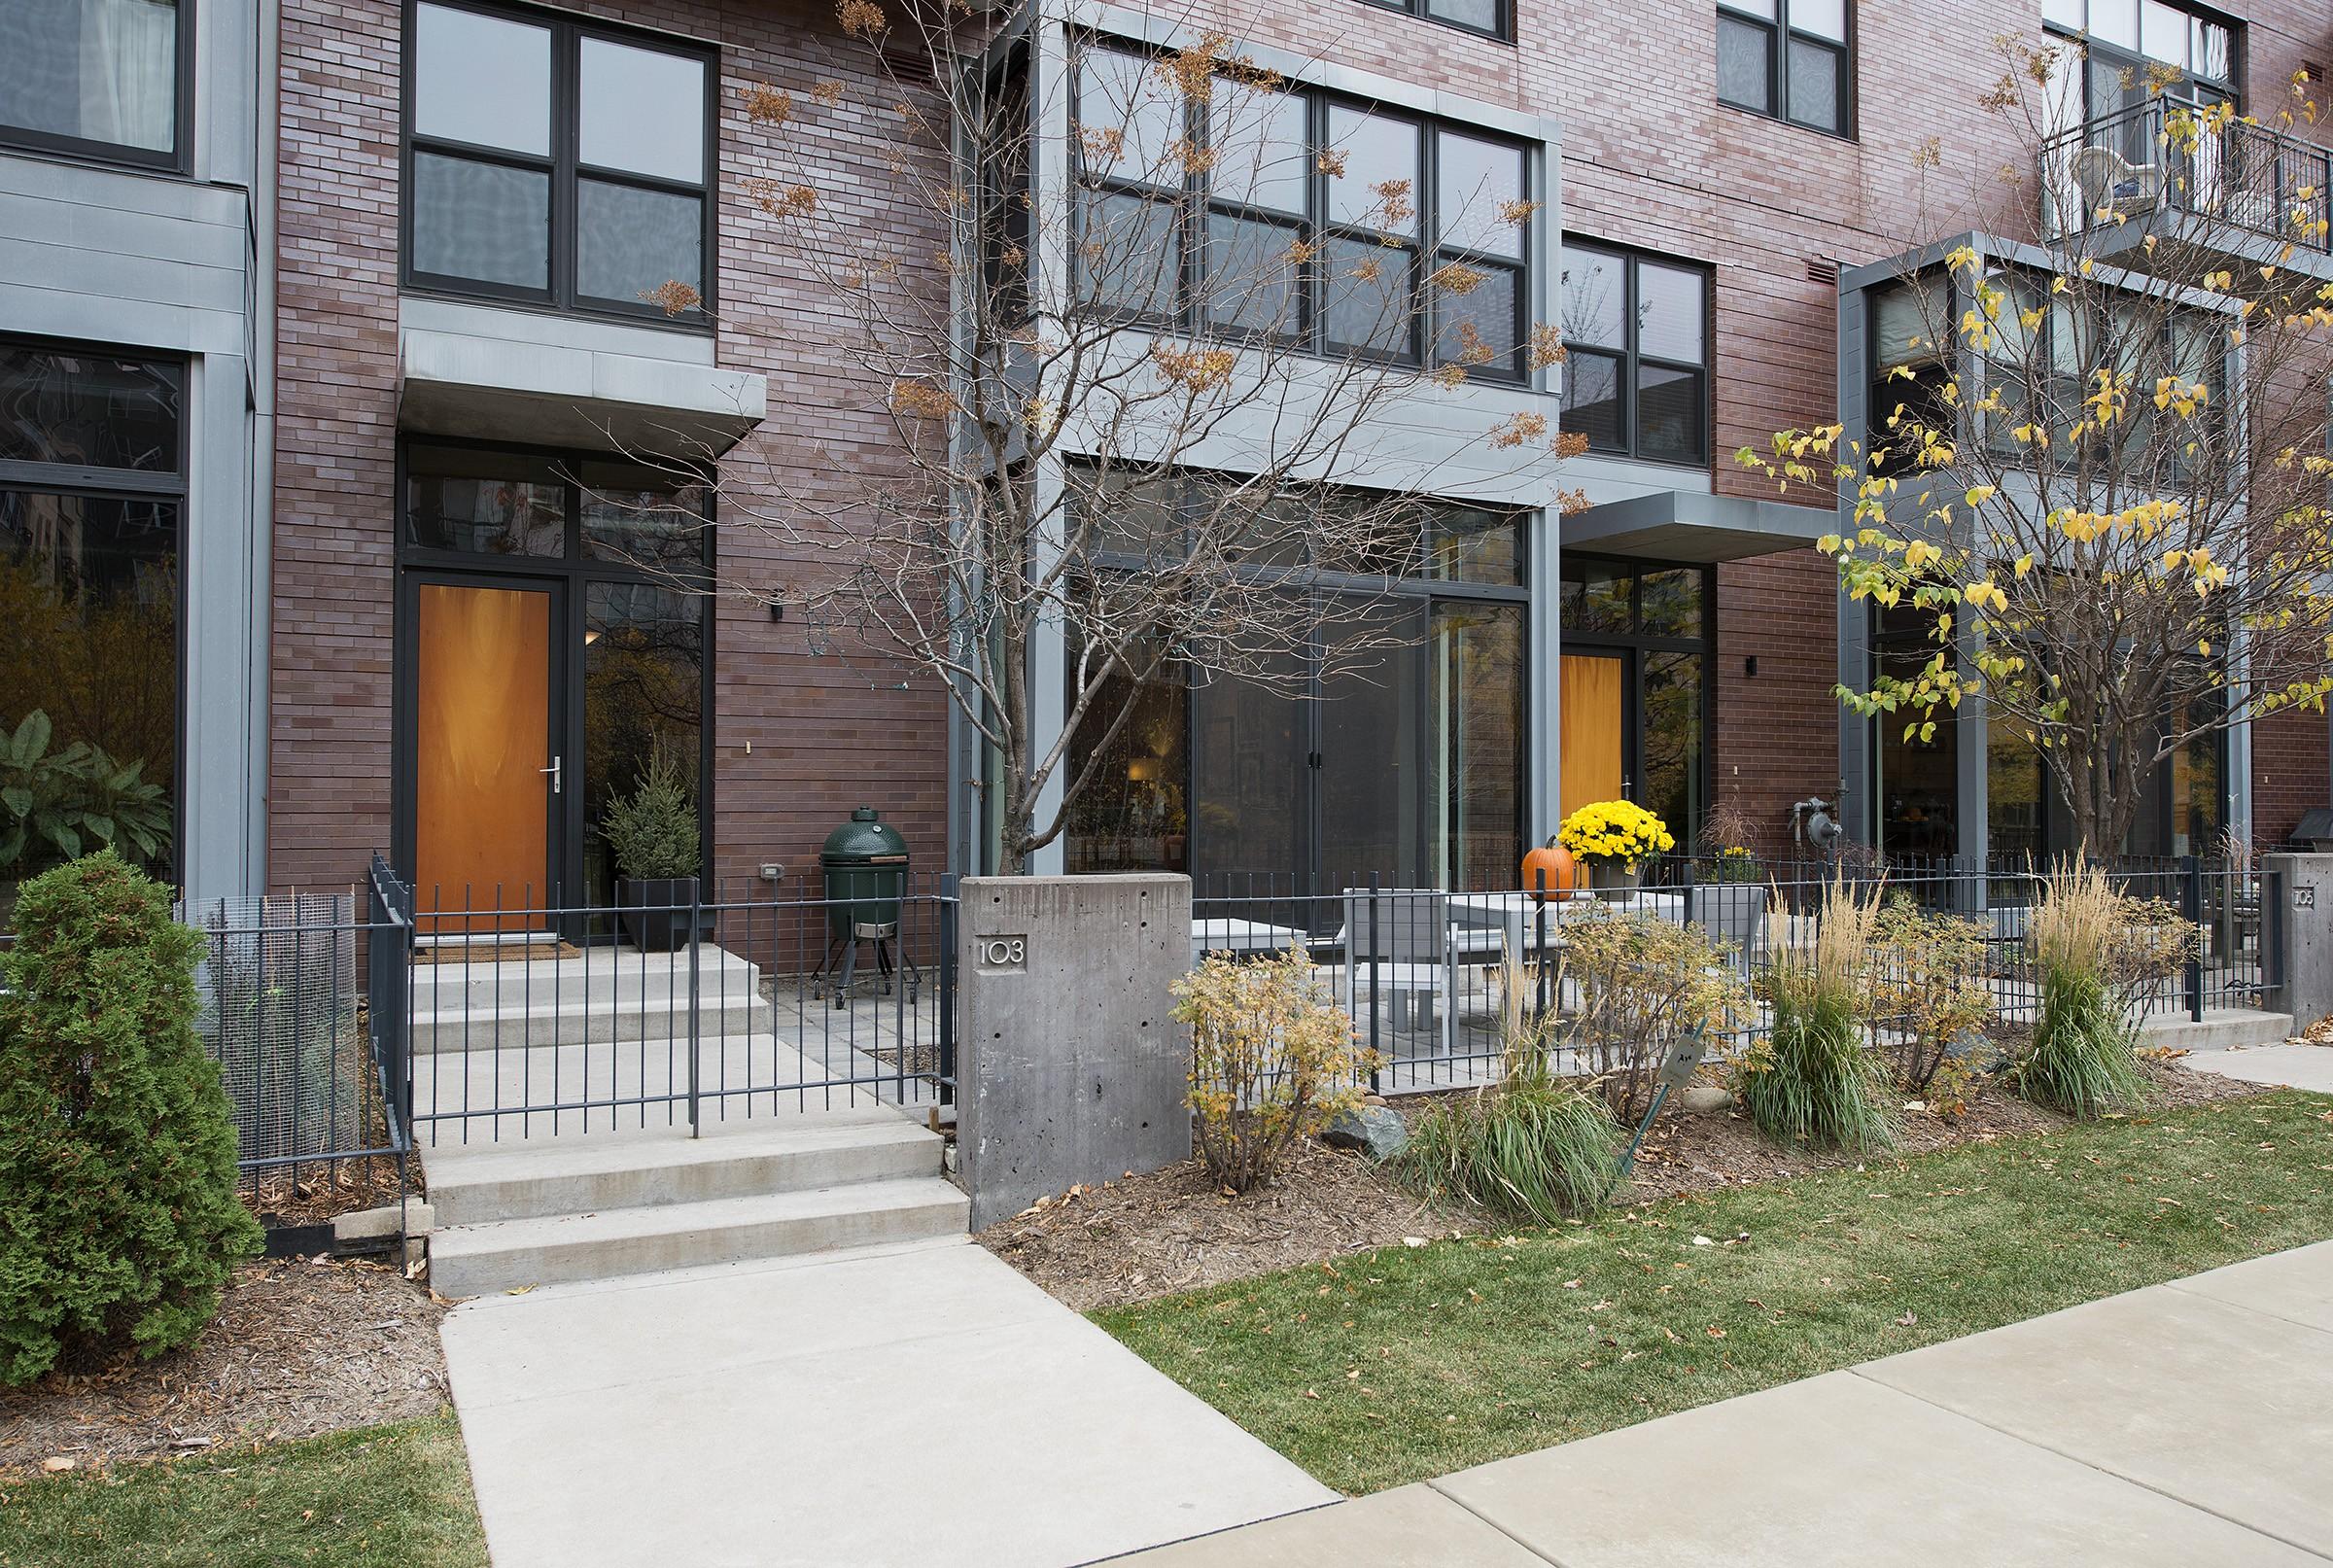 Park Ave #103 exterior 6.23.15.jpg